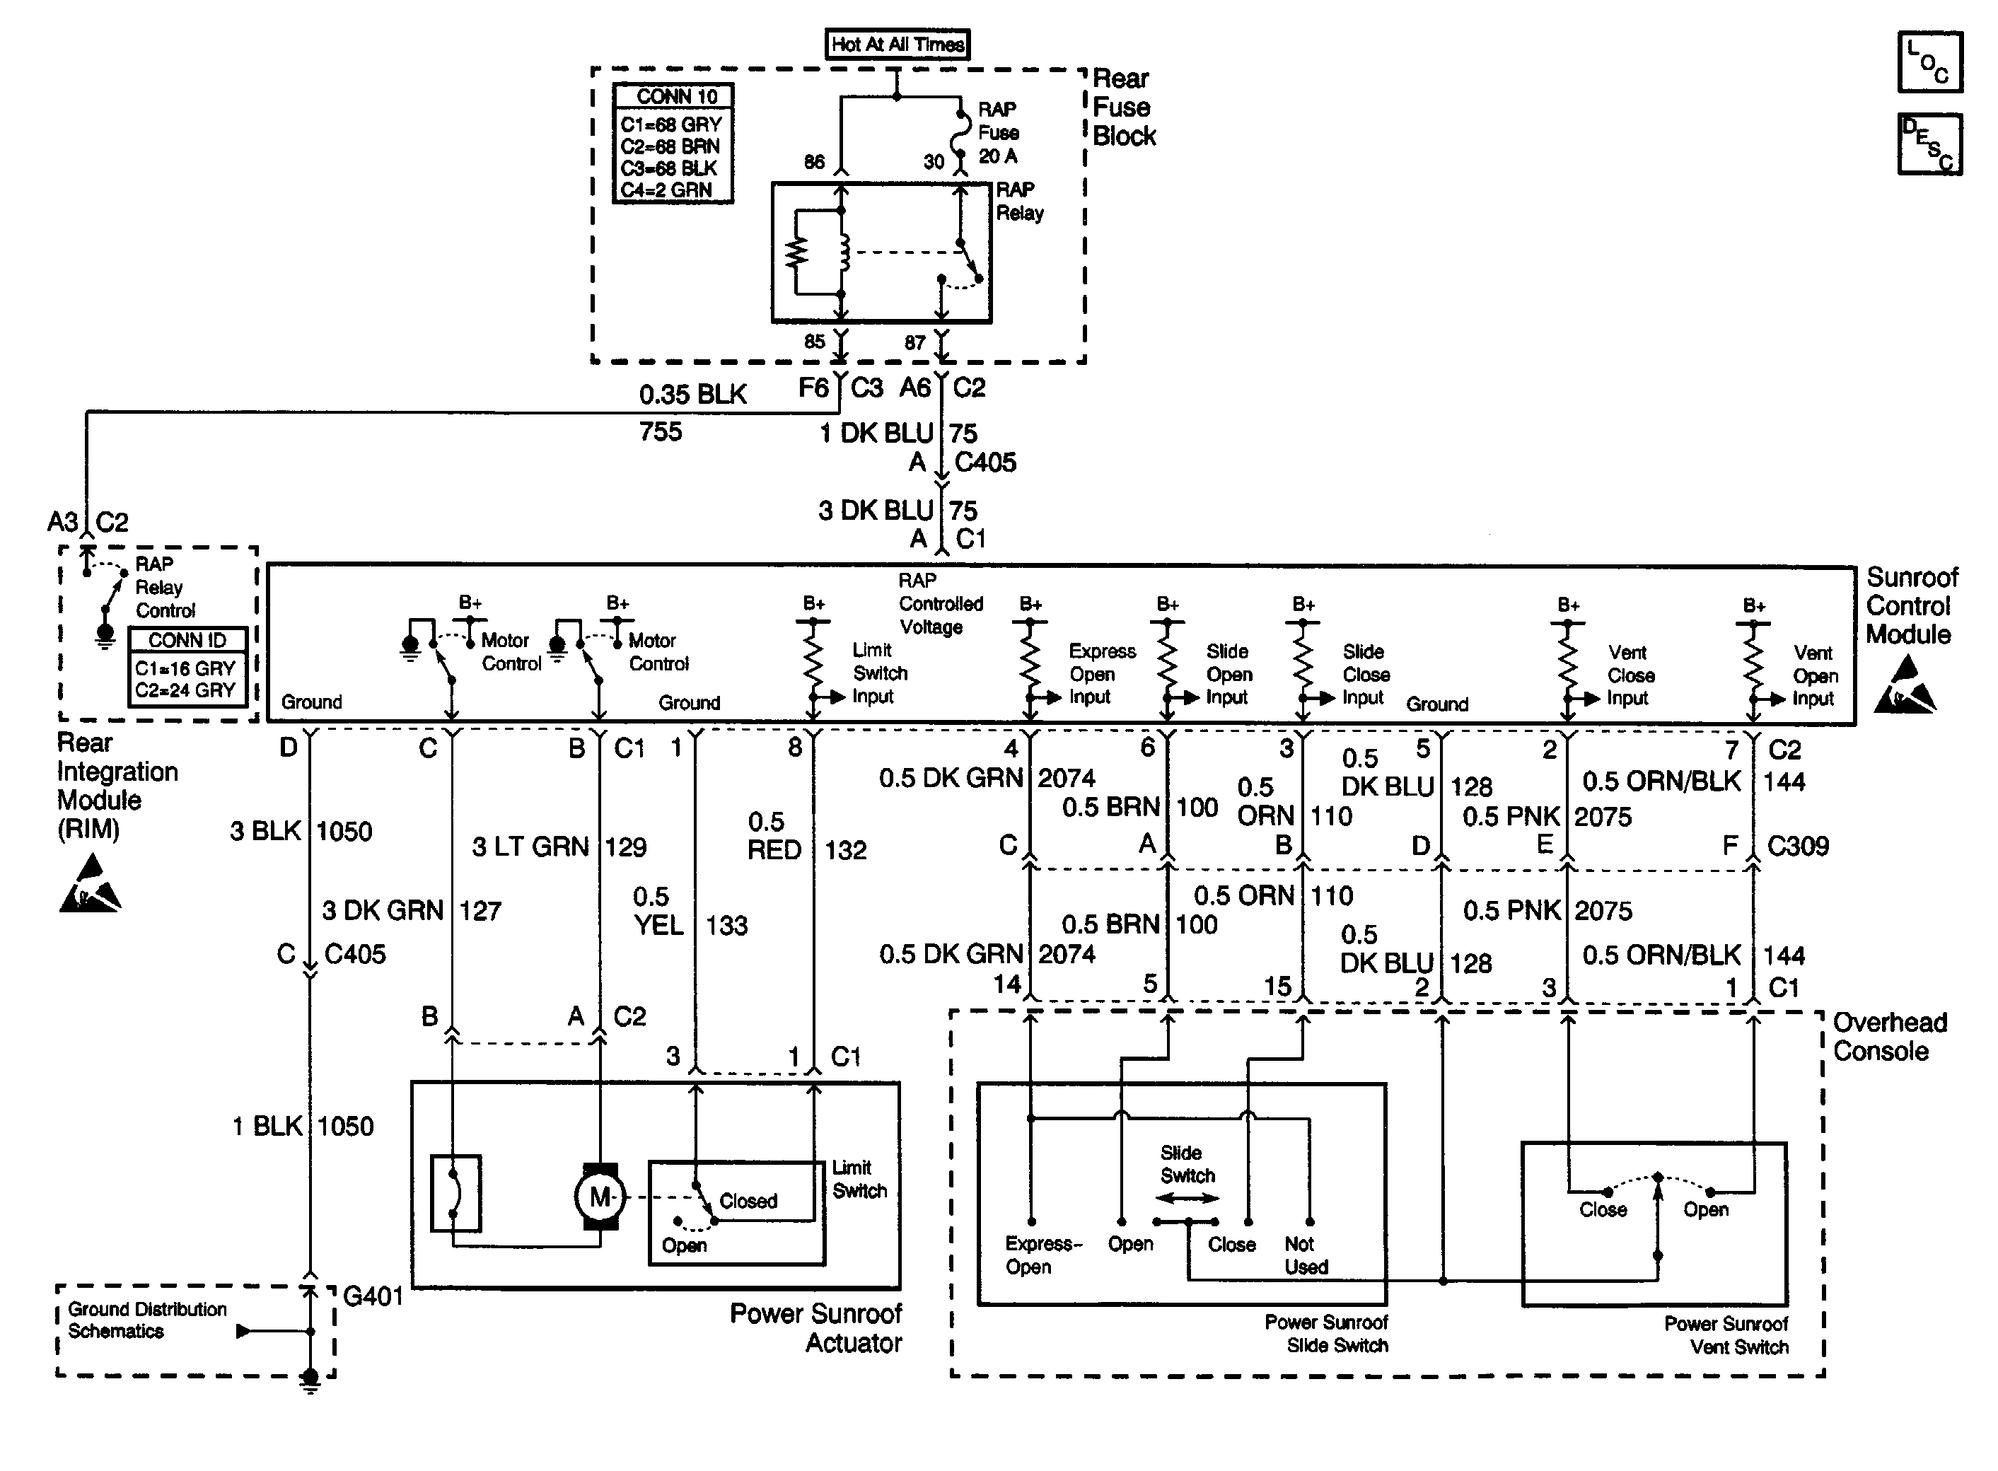 DIAGRAM] 2006 Cadillac Sts Sunroof Wiring Diagram FULL Version HD Quality Wiring  Diagram - DOORBELLWIRING.LEXANESIRAC.FR